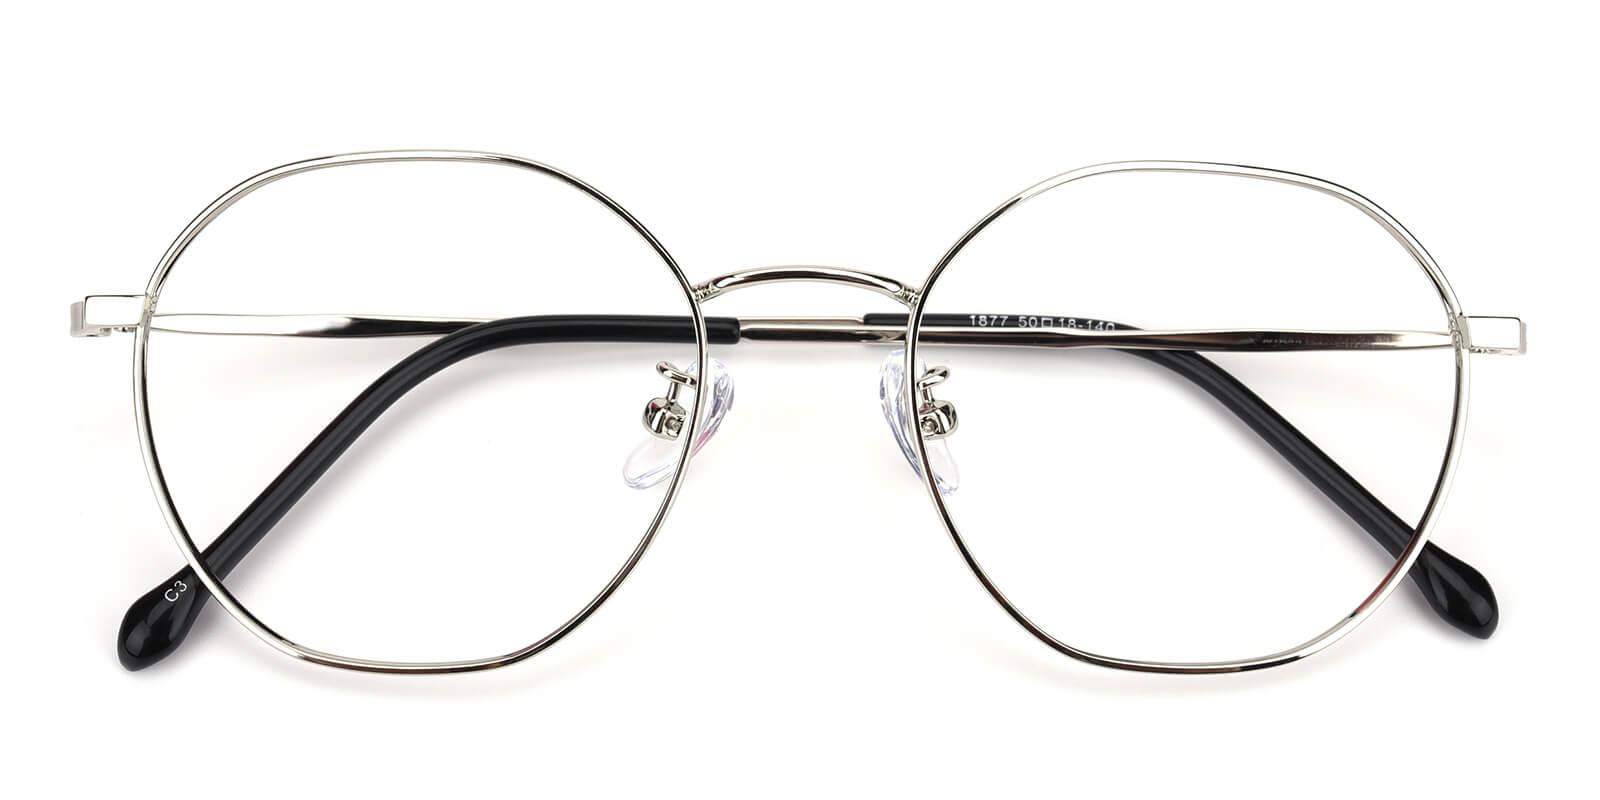 Govind-Silver-Round-Metal-Eyeglasses-detail